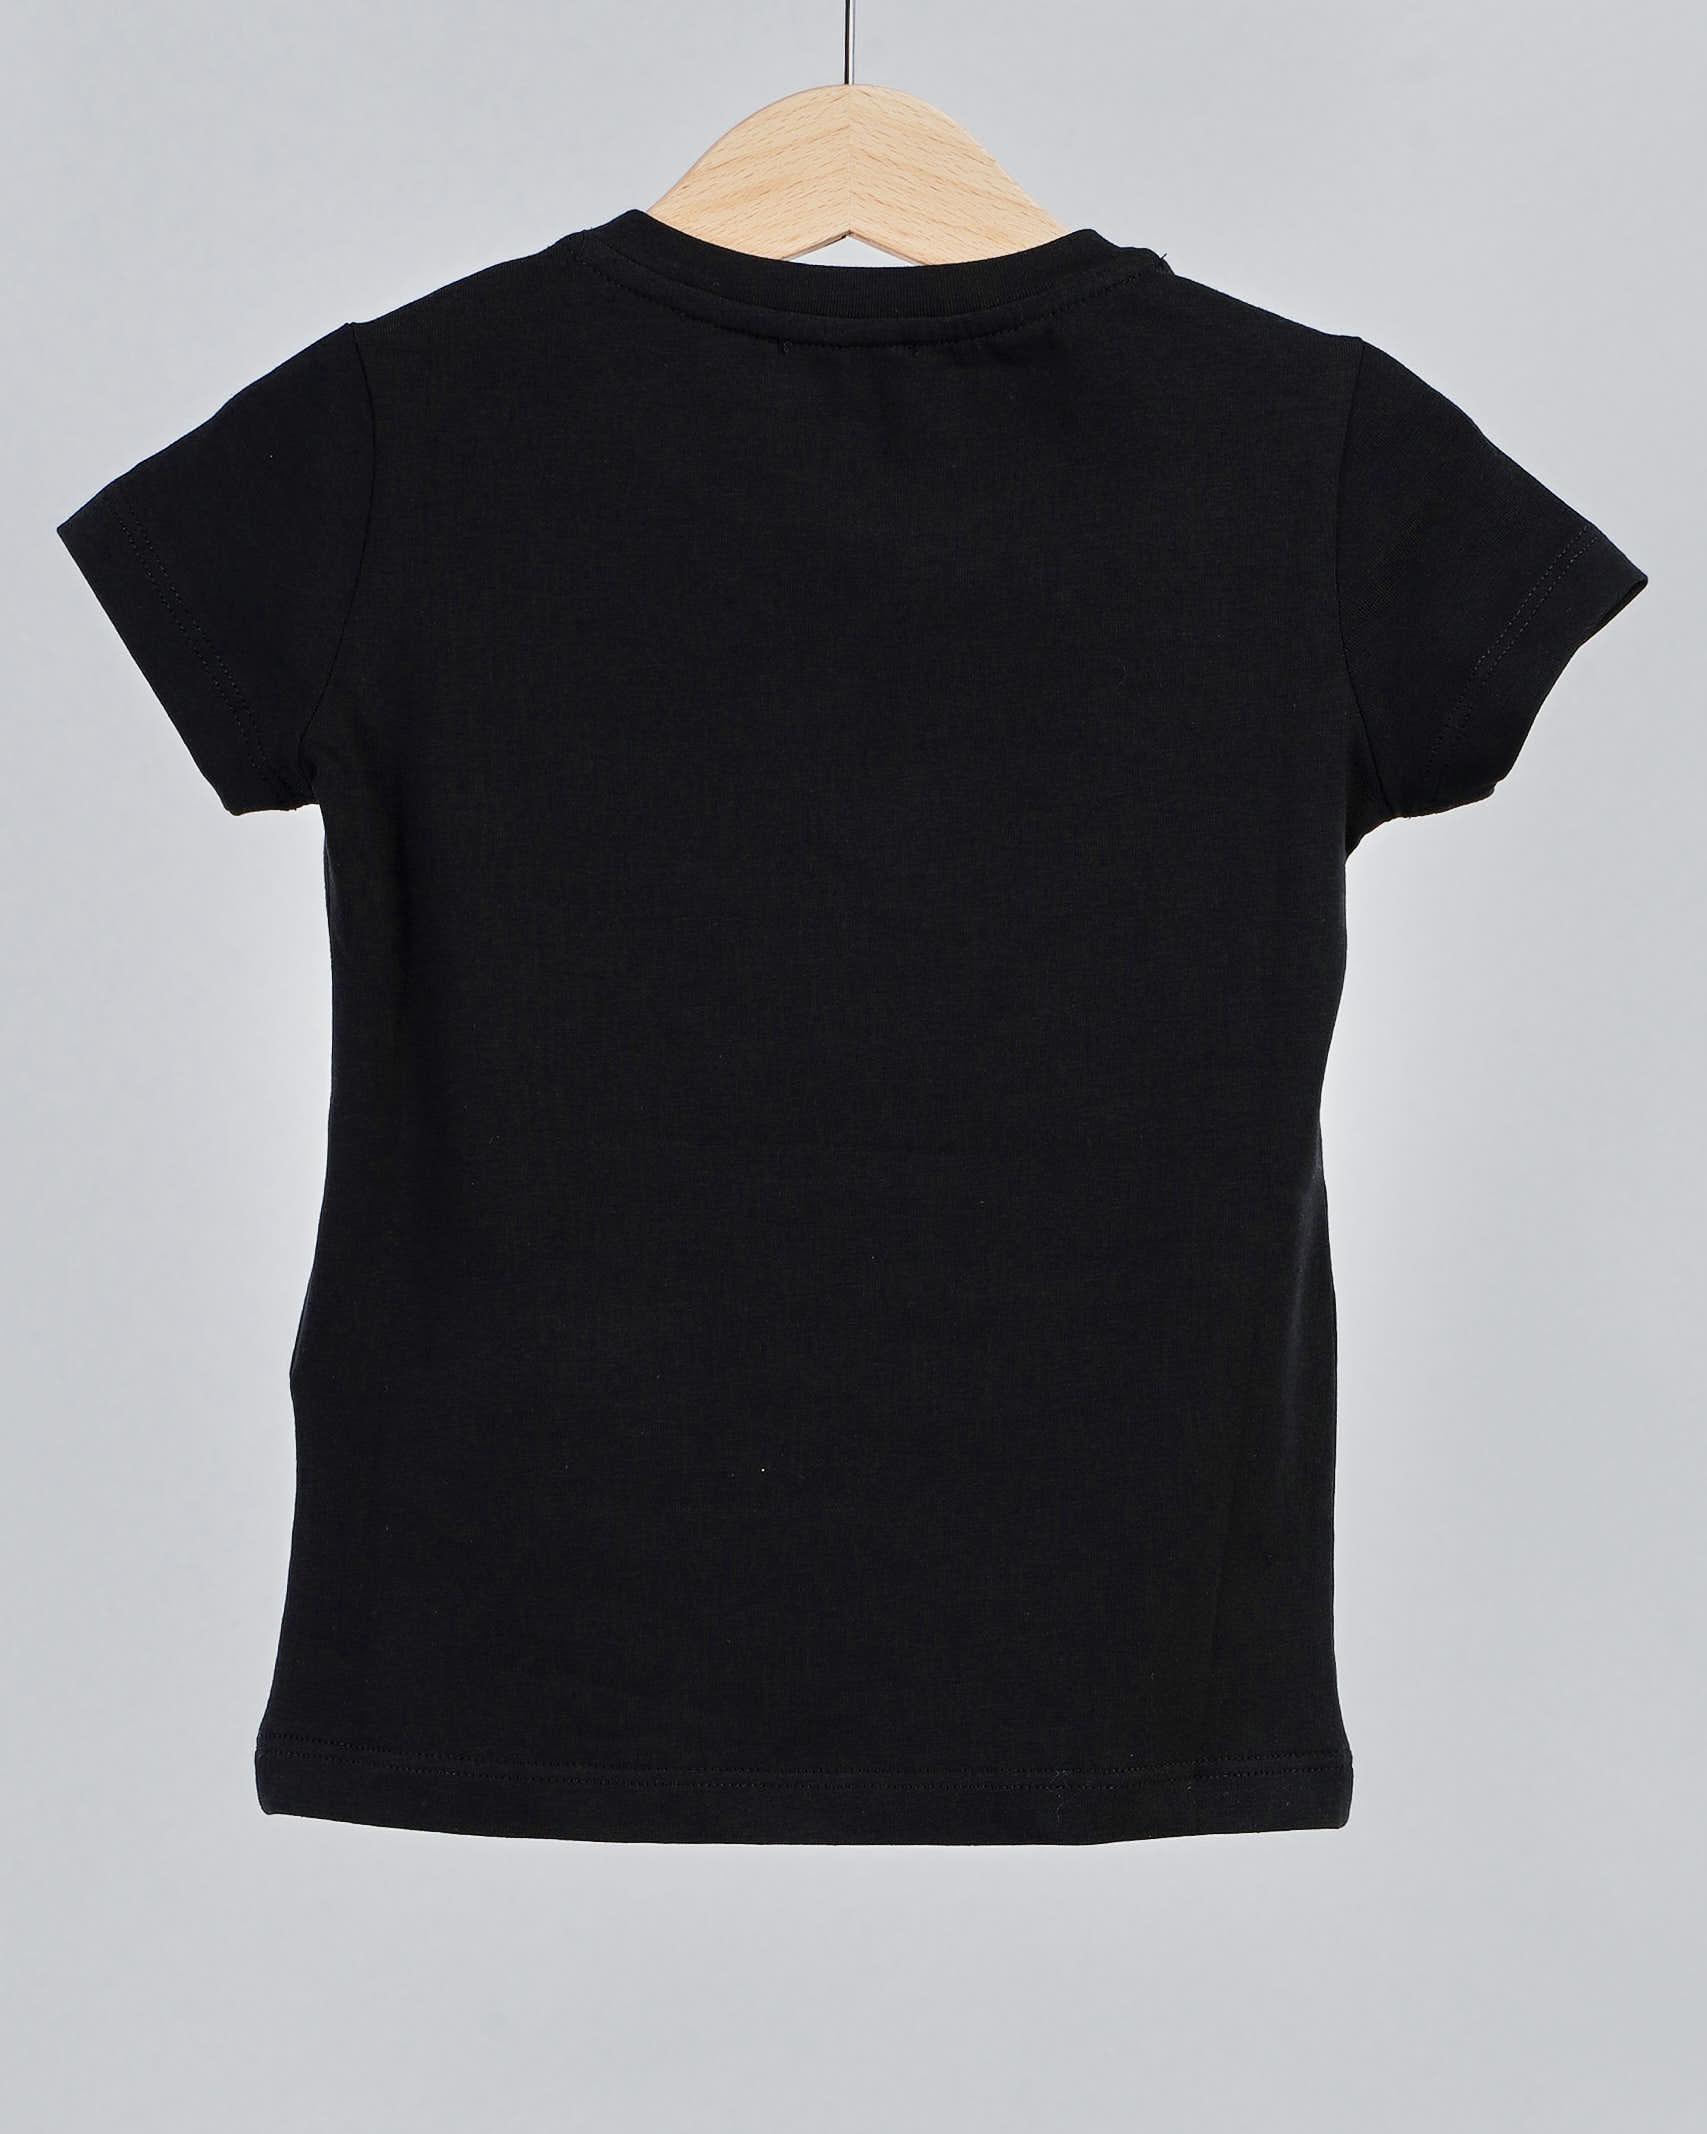 T-shirt con bocca in paillettes Elisabetta Franchi La Mia Bambina ELISABETTA FRANCHI LA MIA BAMBINA | T-shirt | EFTS138JE95WE037N020